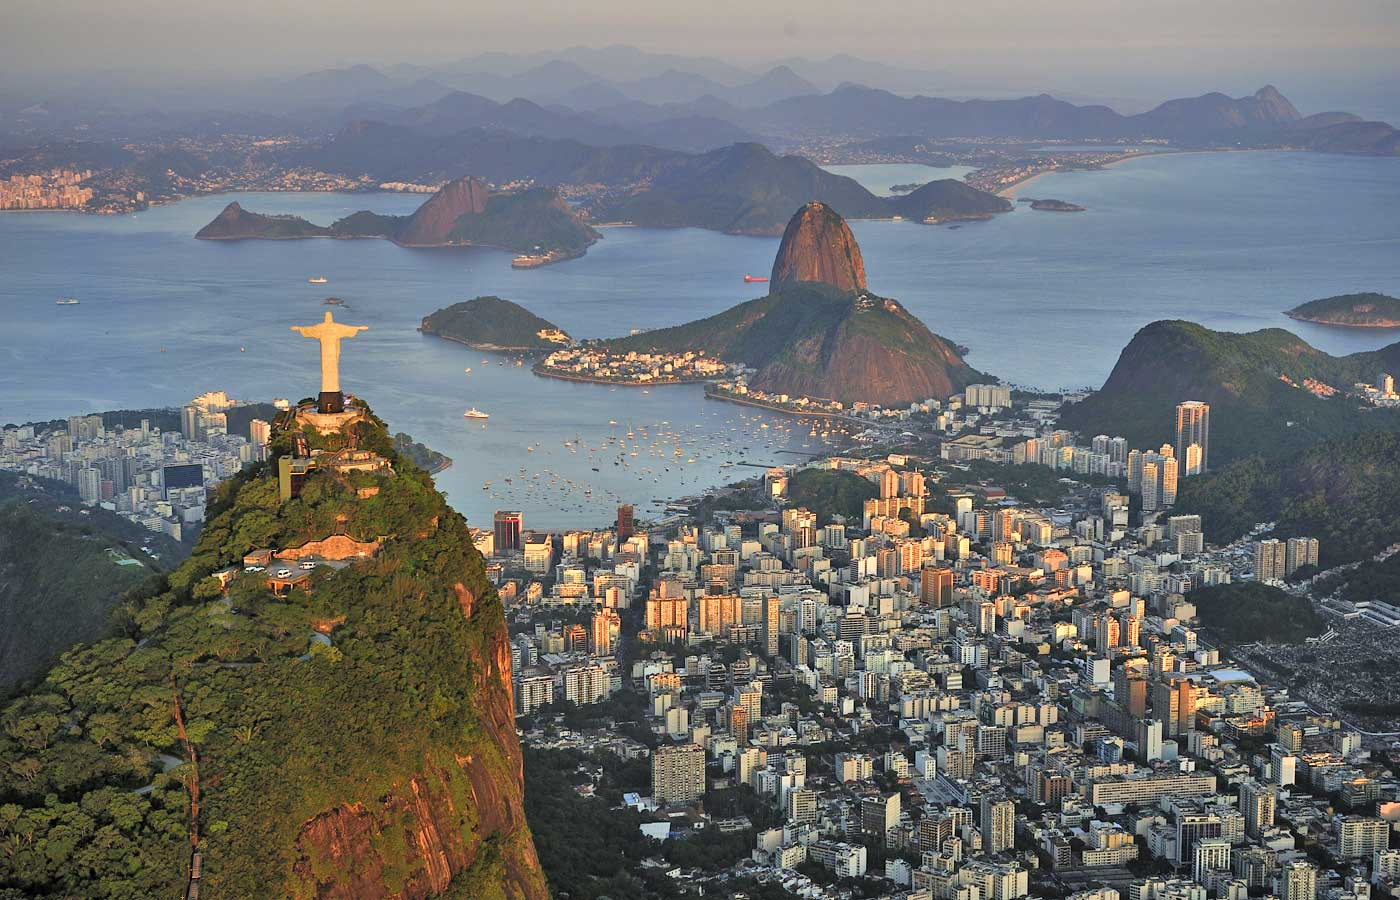 Luxury holidays to Rio de Janeiro